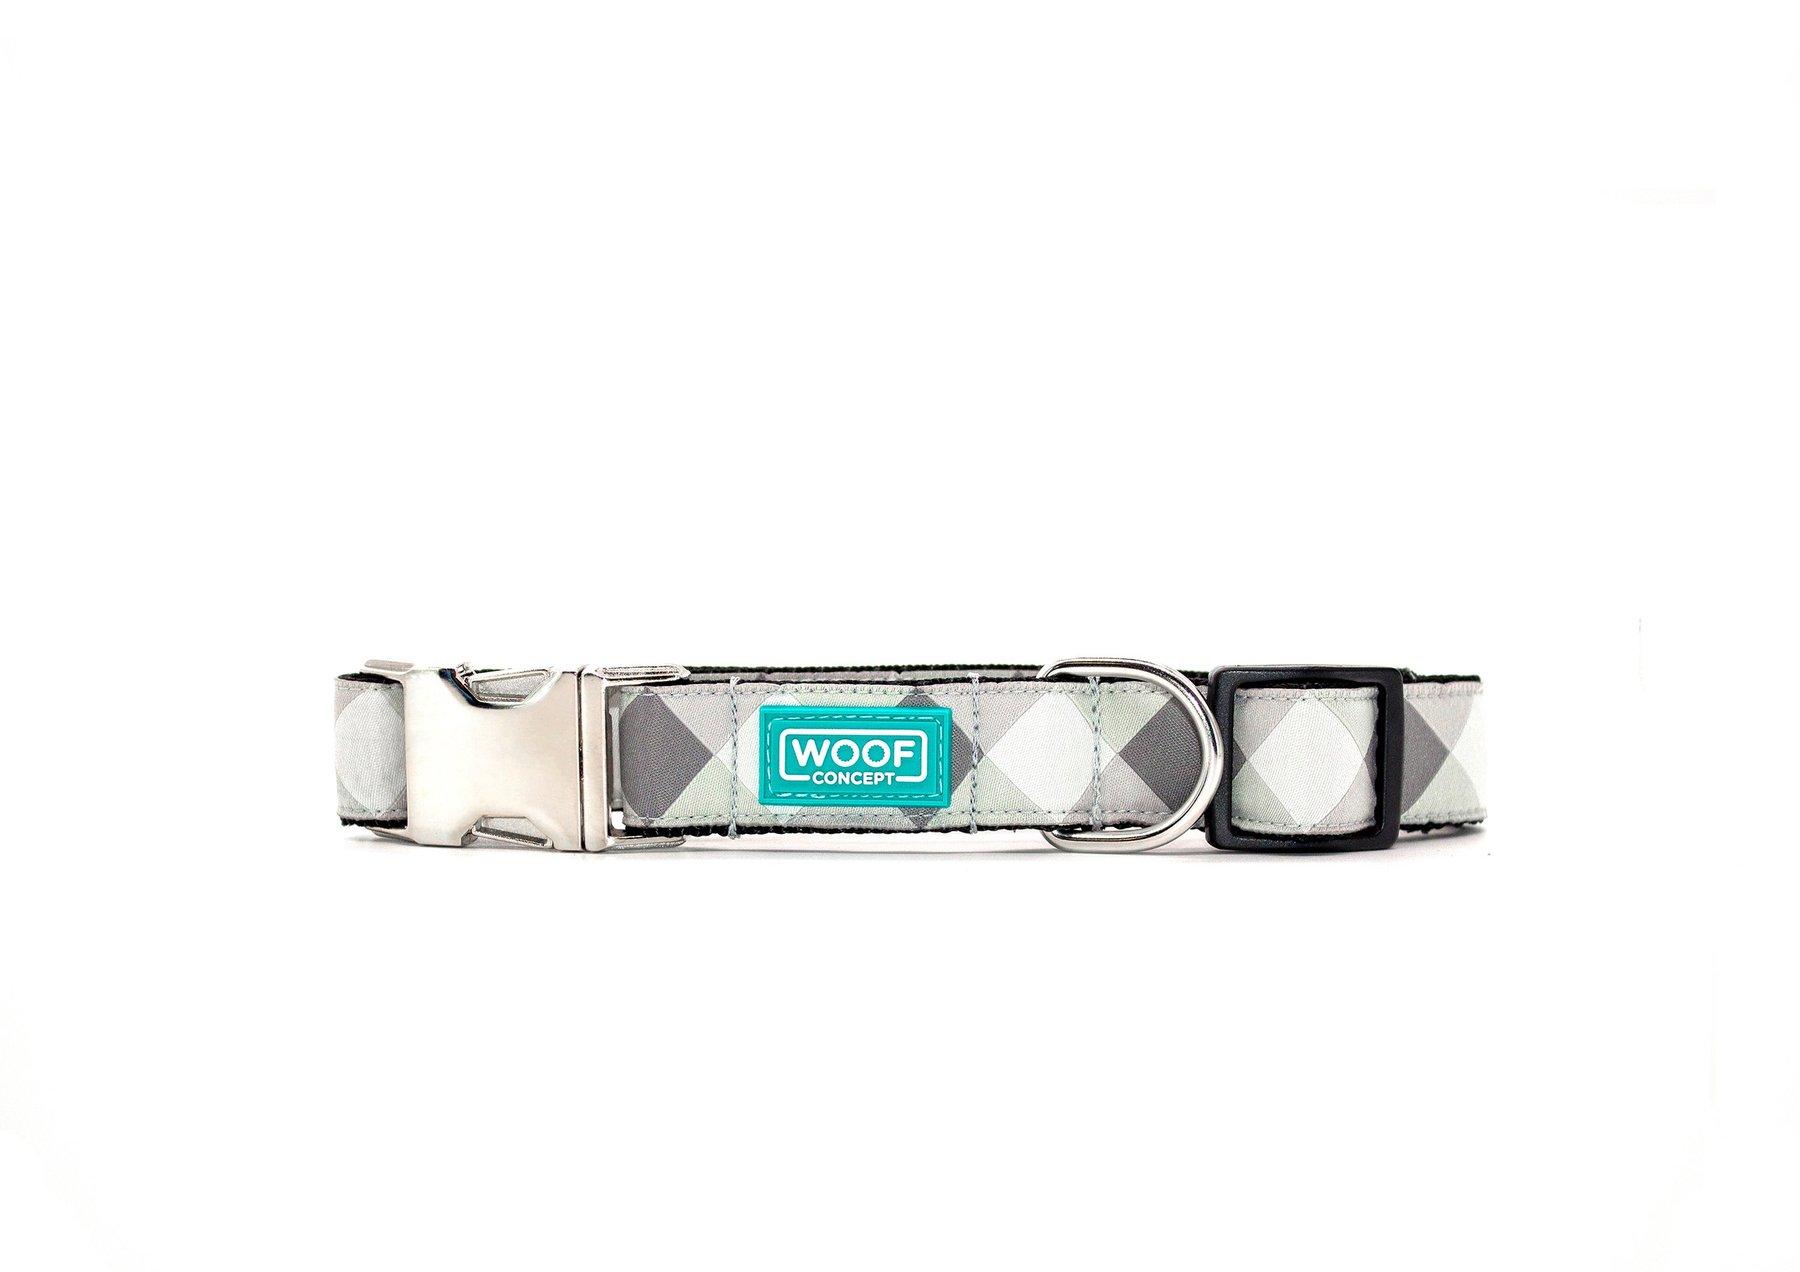 Woof Concept Premium Dog Collar, Smart Casual Image